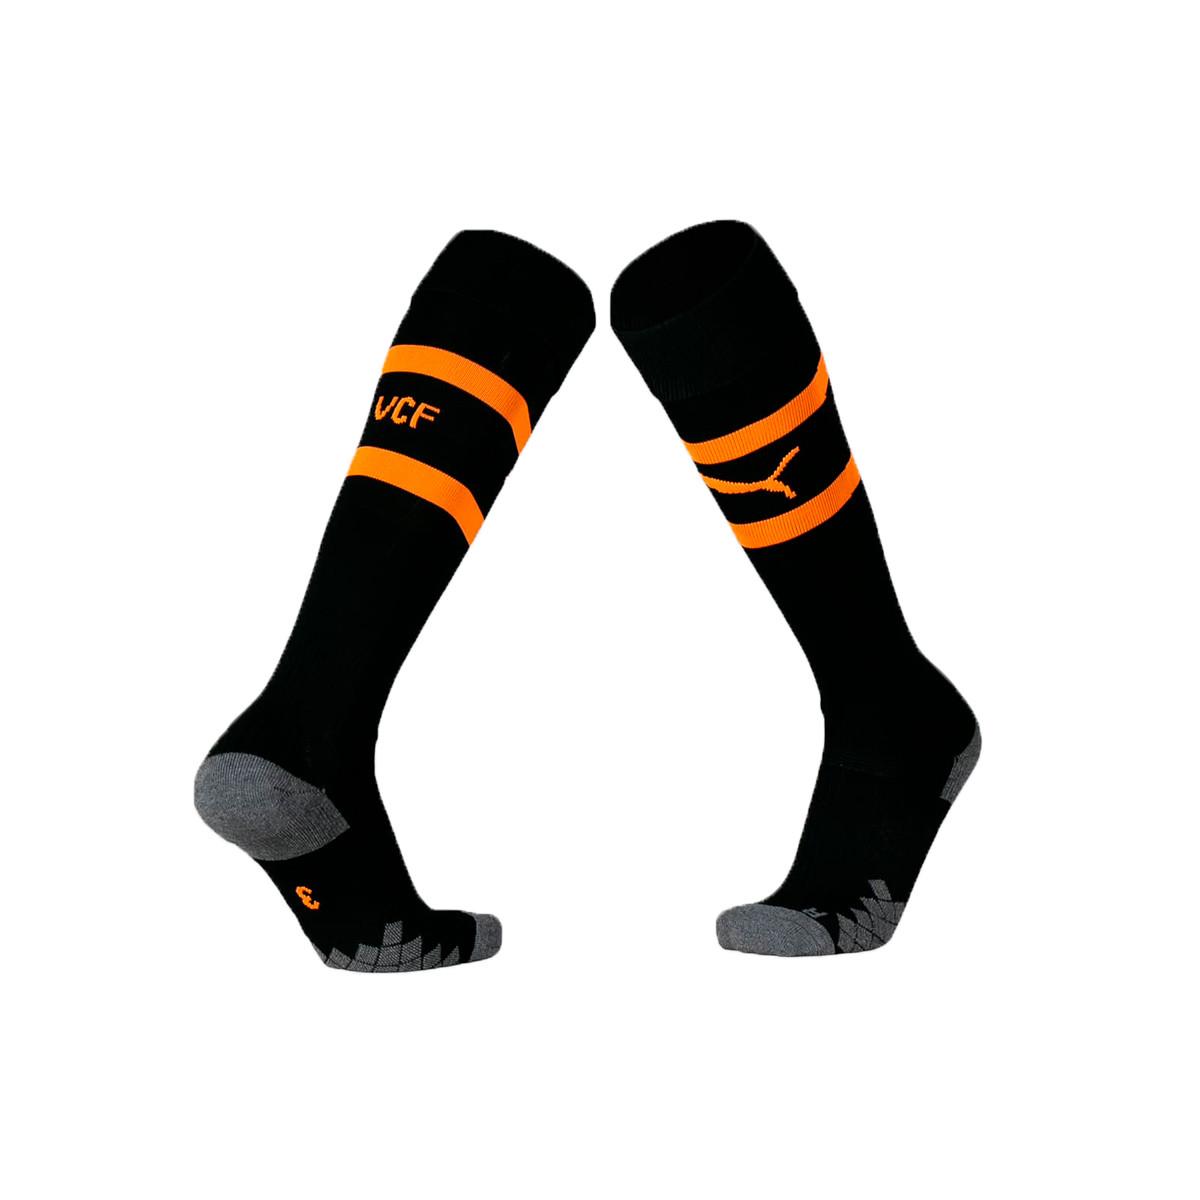 03eea4237 Football Socks Puma Valencia CF Segunda Equipación 2019-2020 Puma  black-Vibrant orange - Football store Fútbol Emotion